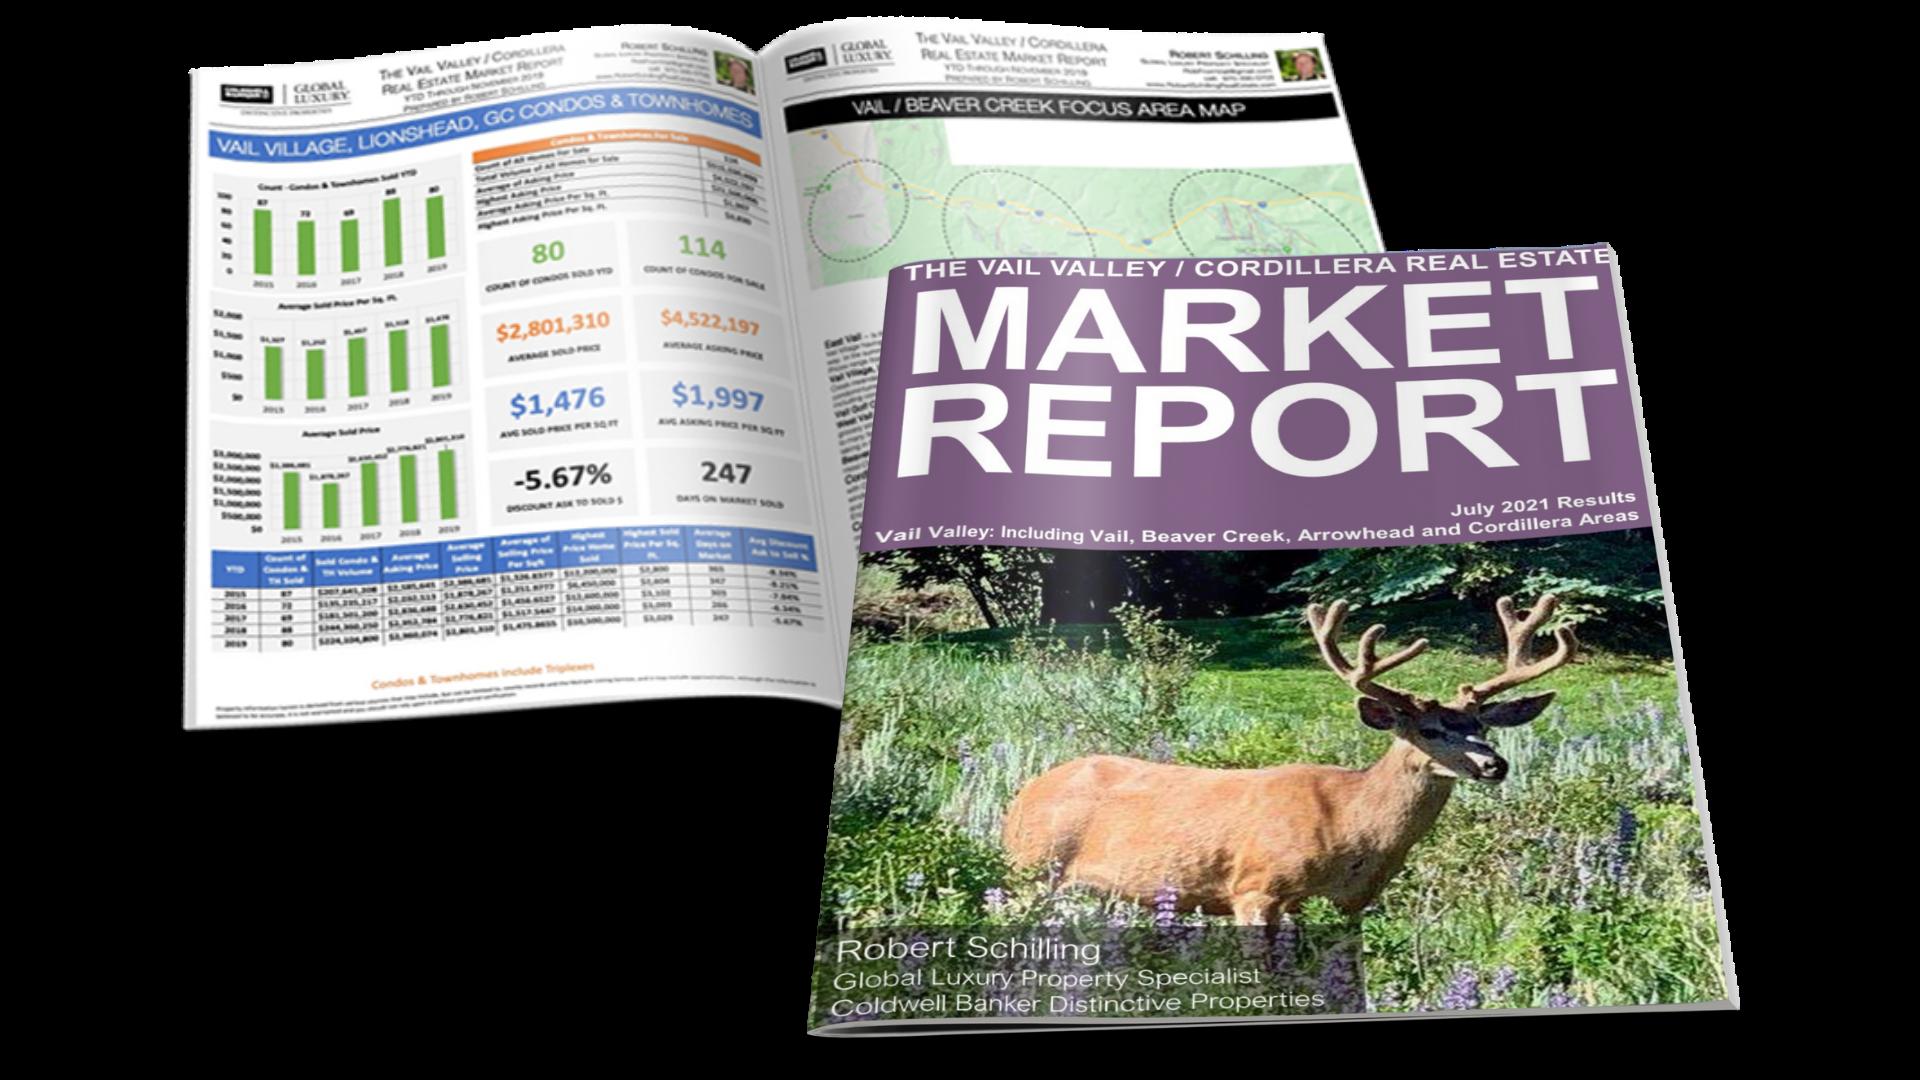 VAIL VALLEY/CORDILLERA REAL ESTATE MARKET REPORT JULY 2021